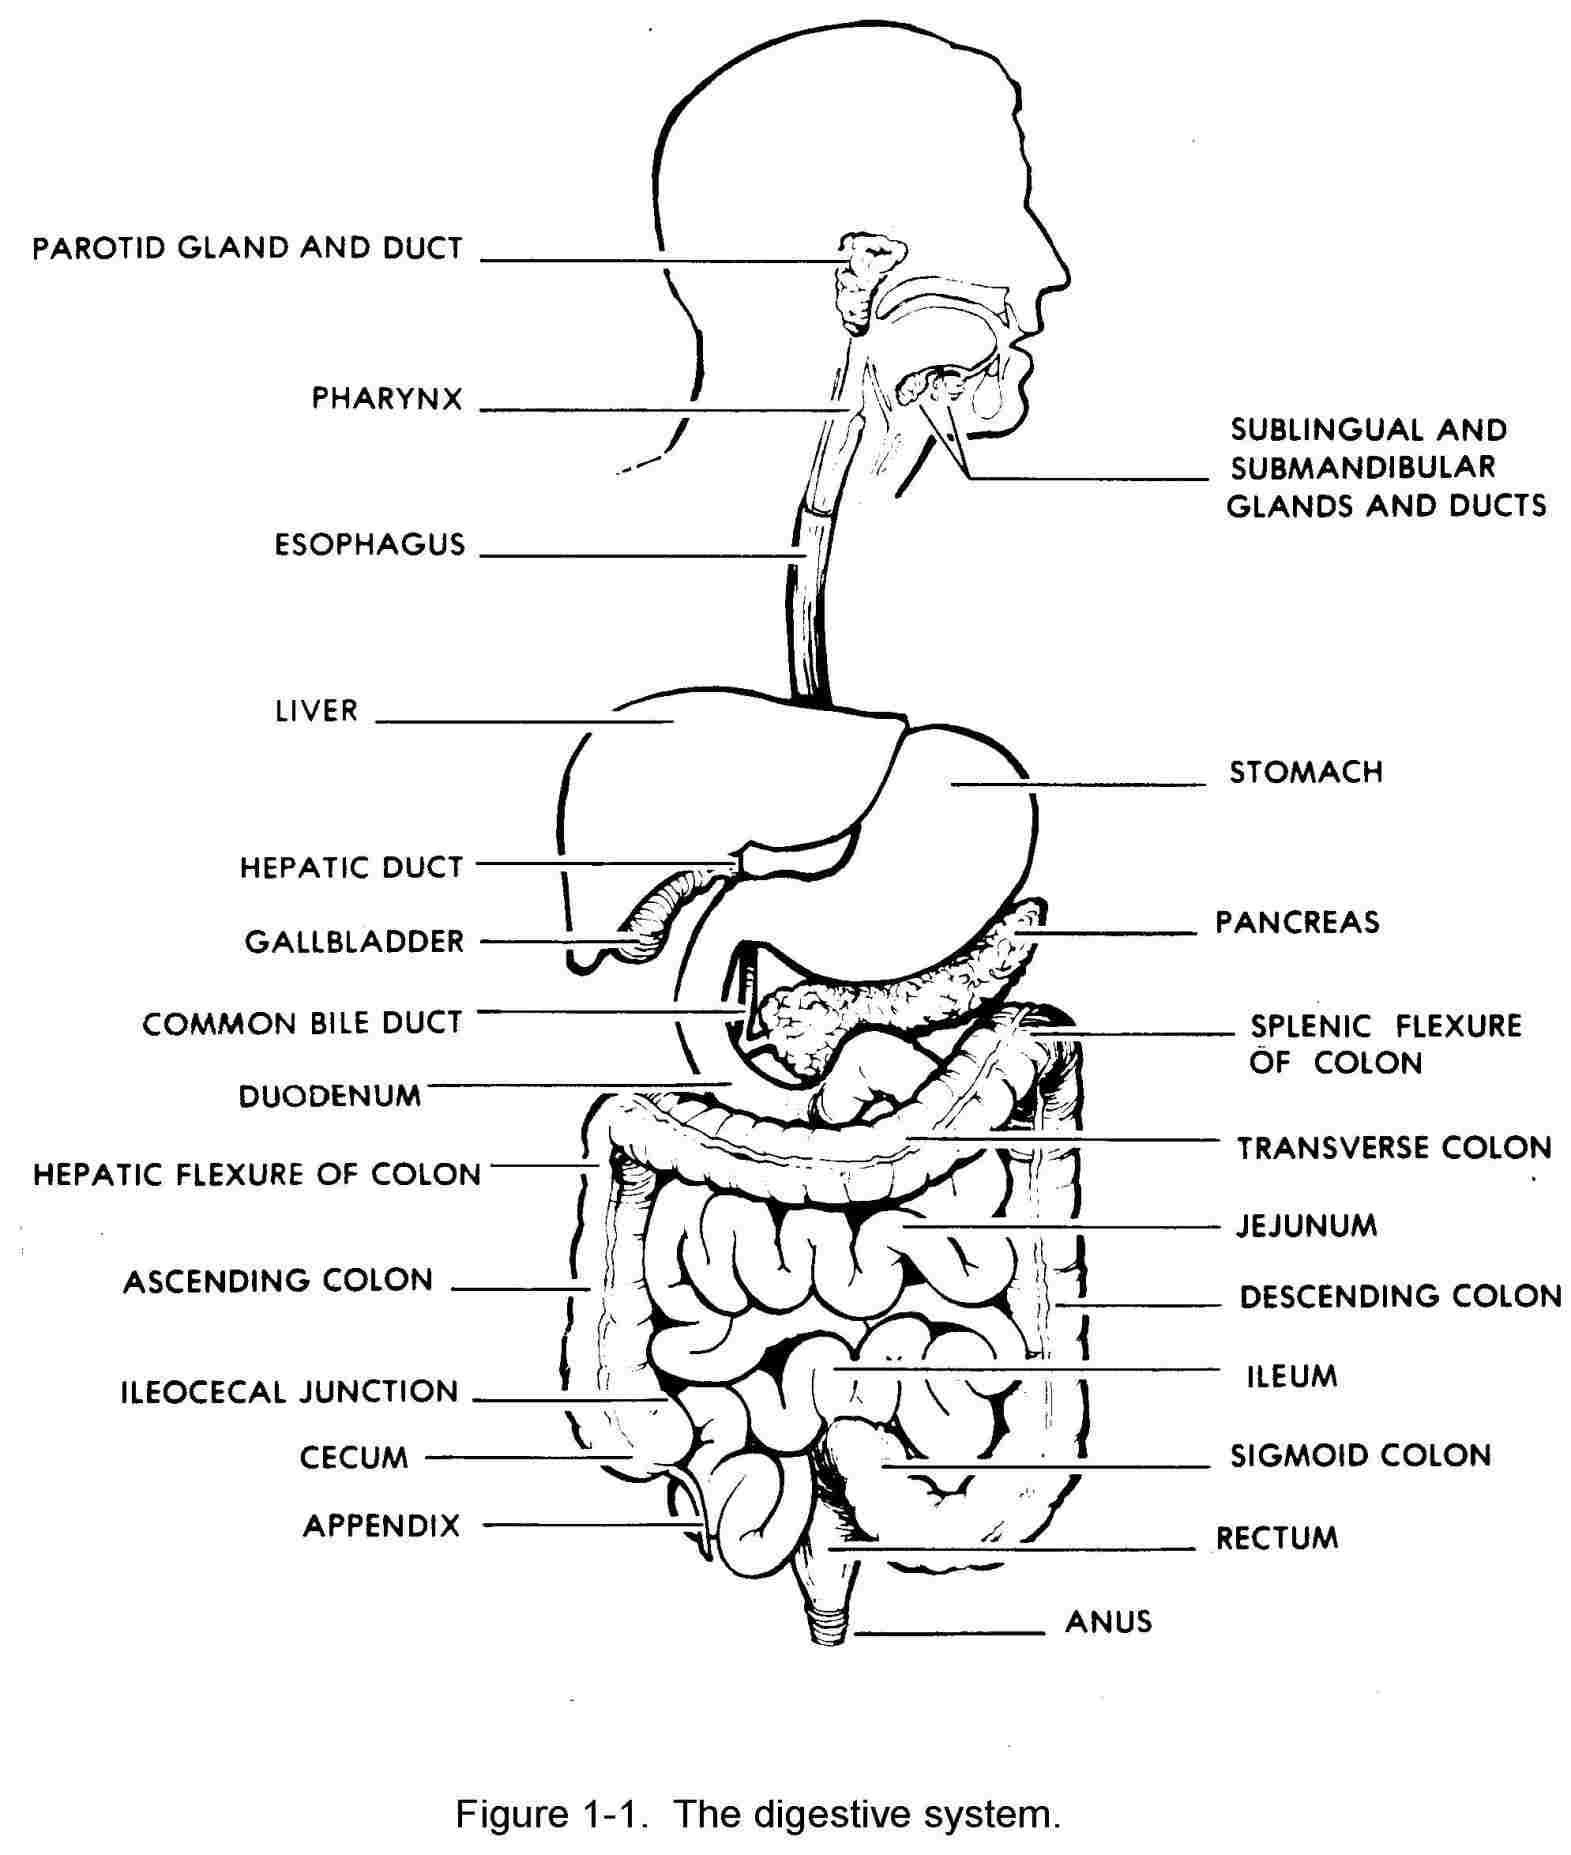 Diagram Of Digestive System Digestion Diagram Simple Wiring Diagram All